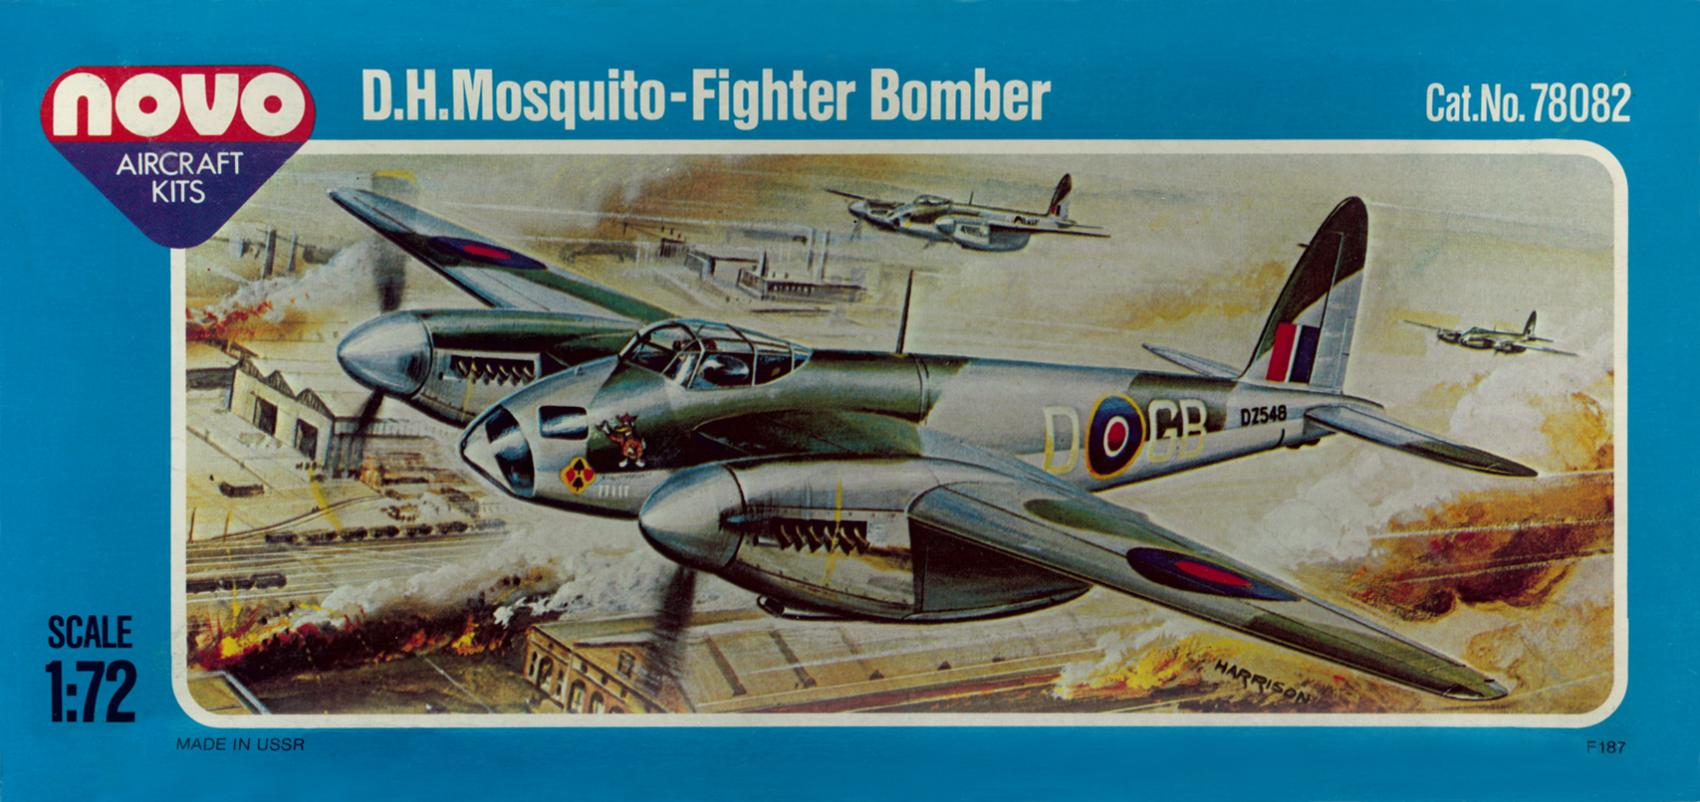 Novo-78082-Mosquito Kit-Archäologie: DeHavilland Mosquito in 1:72 von FROG F.187